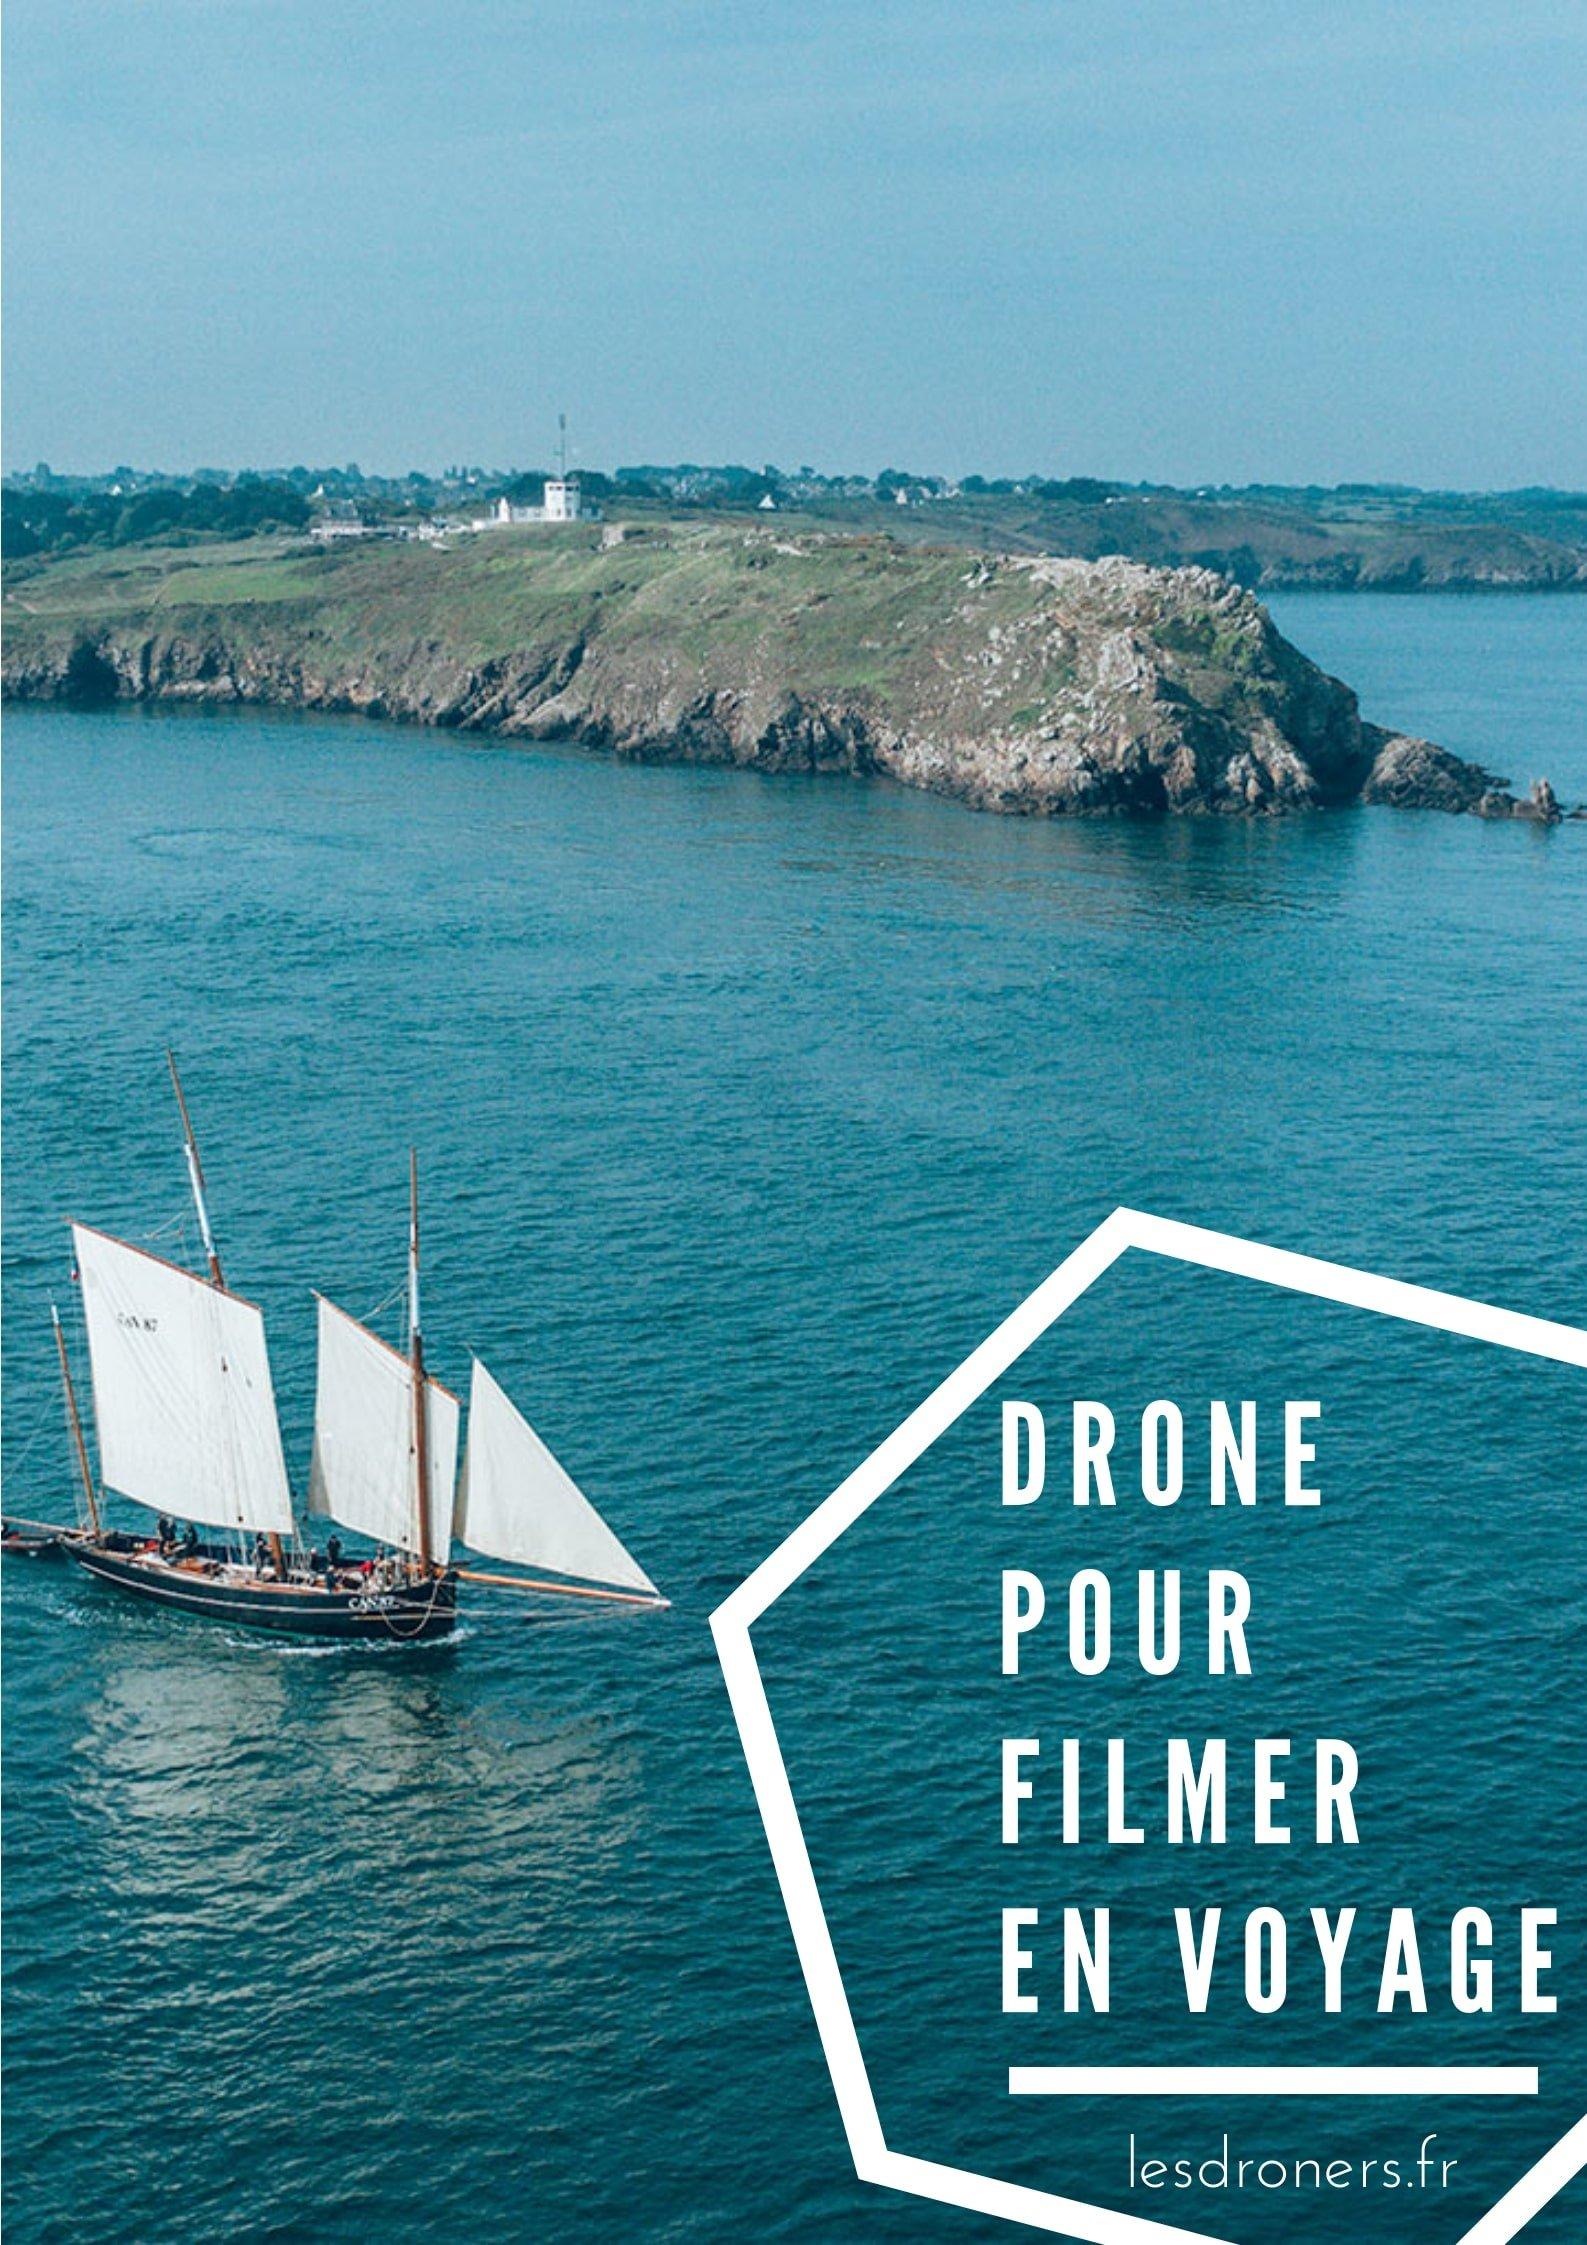 drone pour filmer voyage